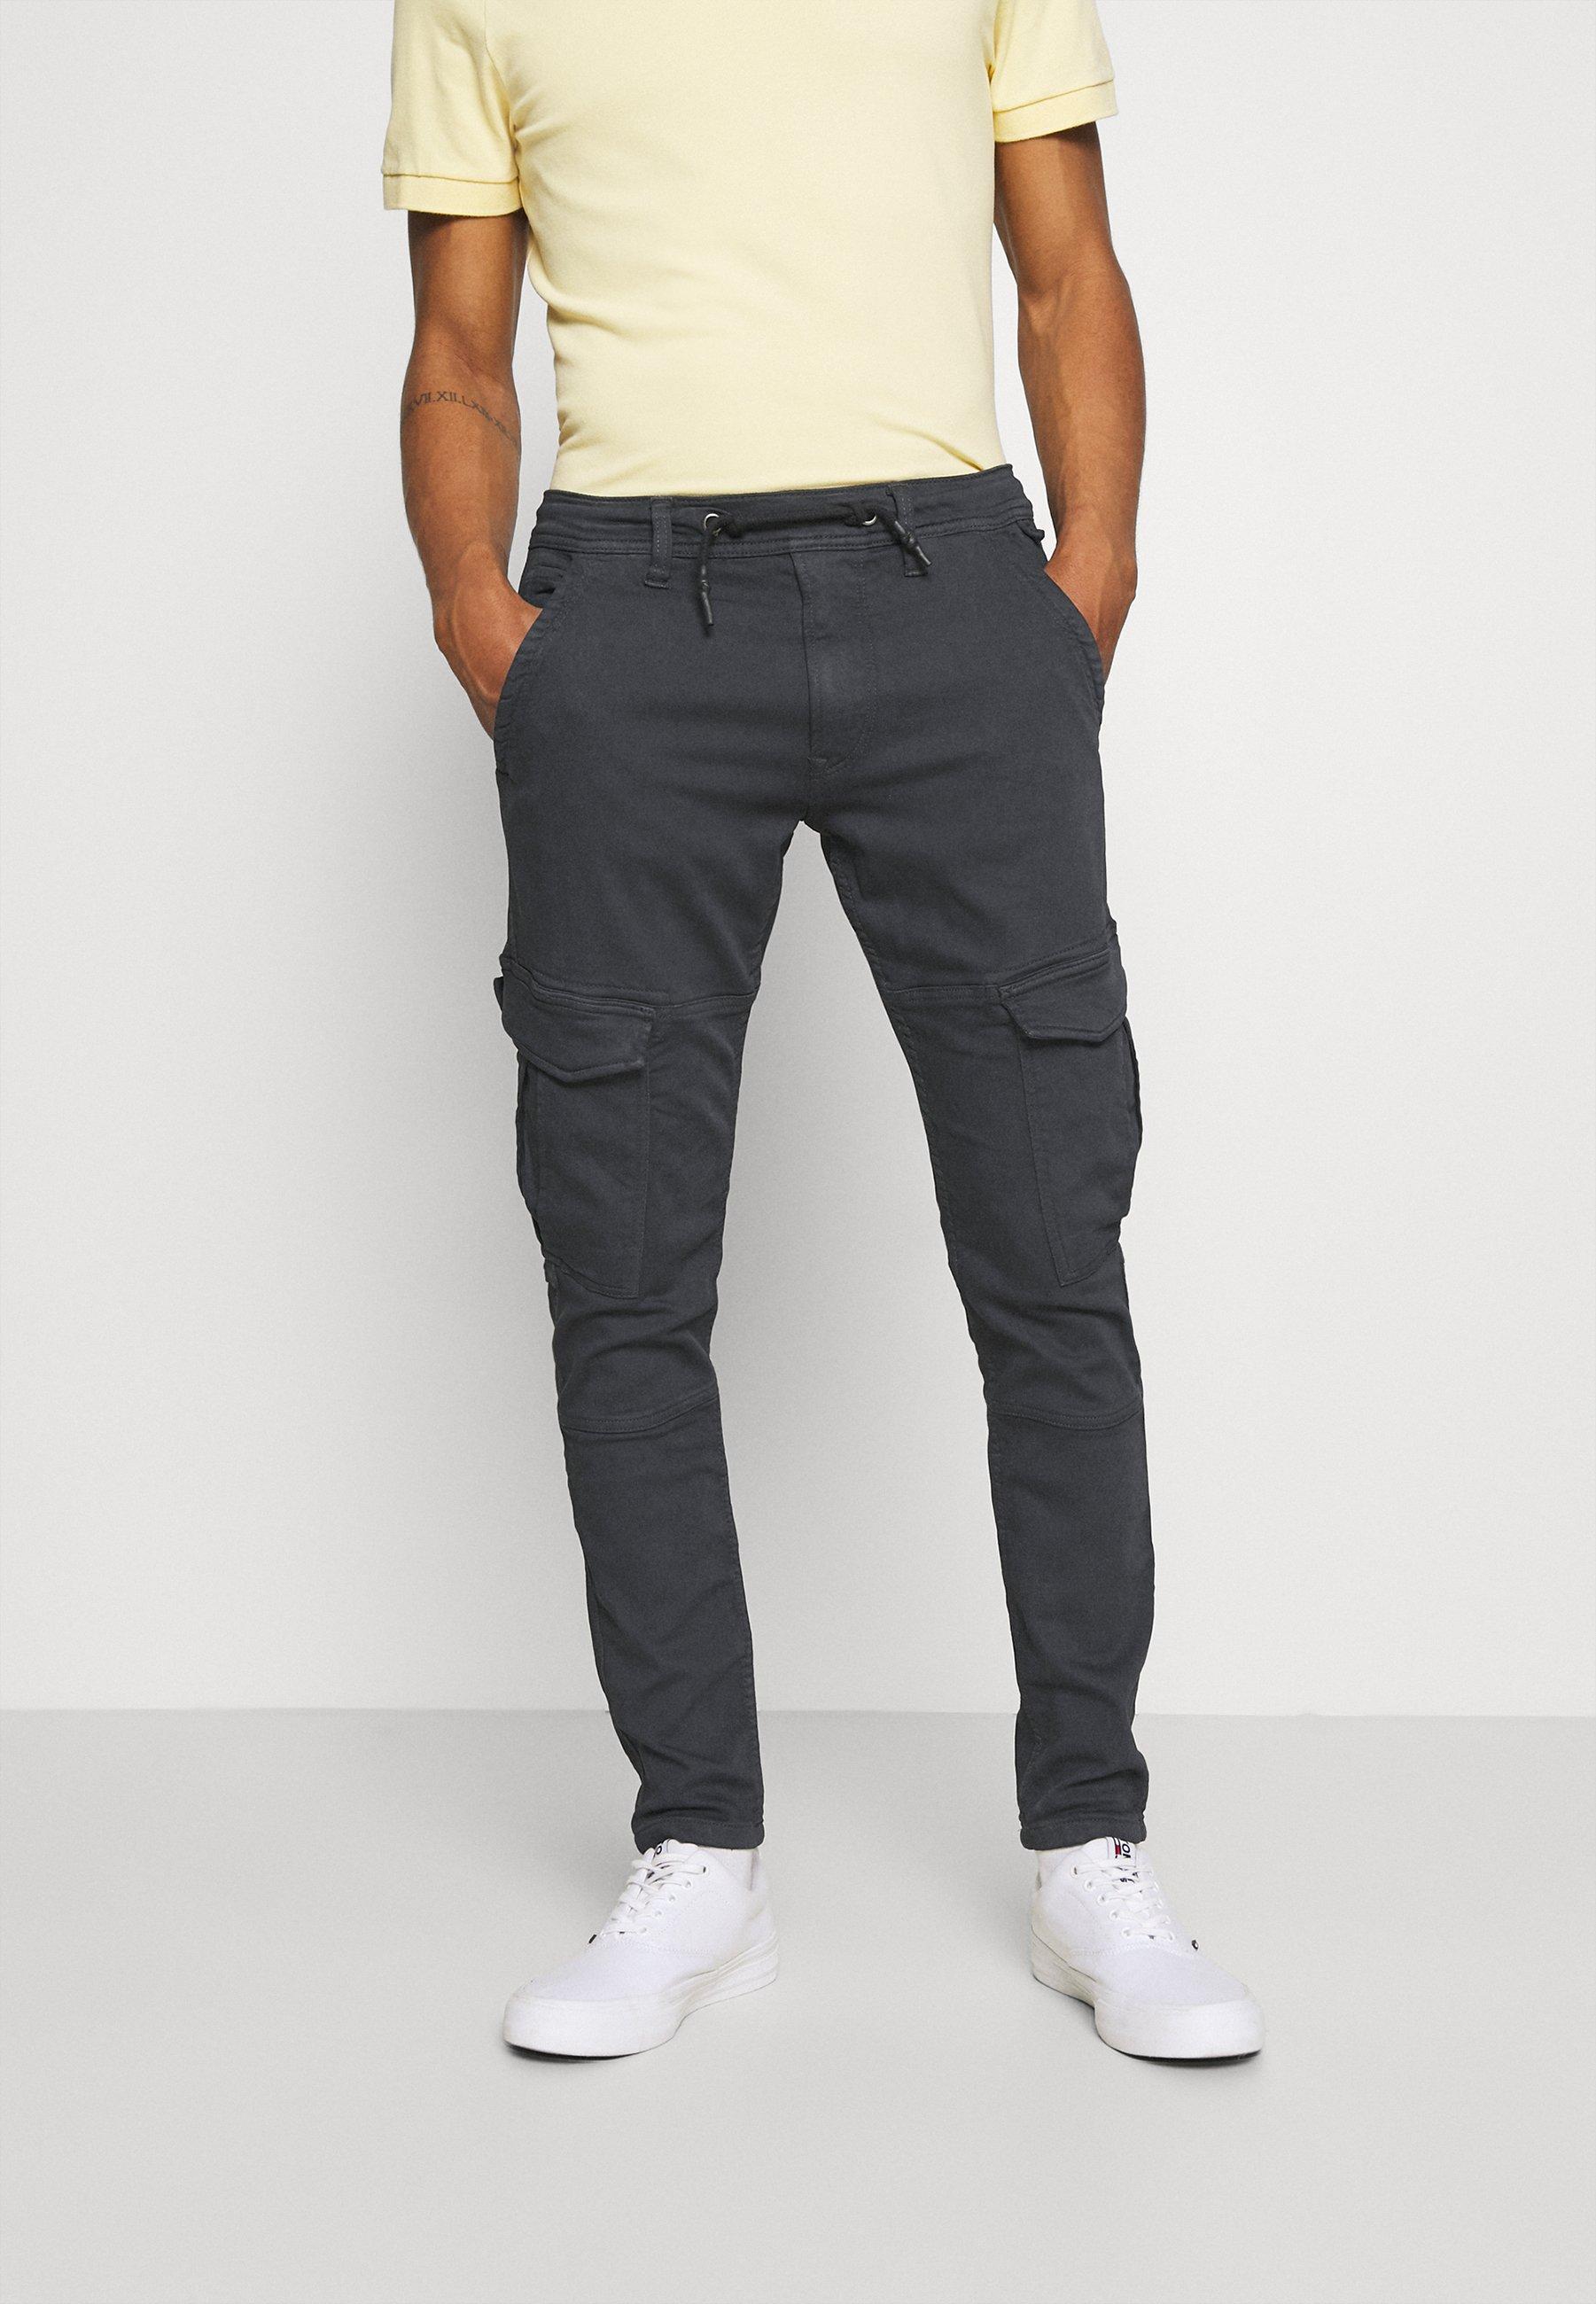 Homme JARED - Pantalon cargo